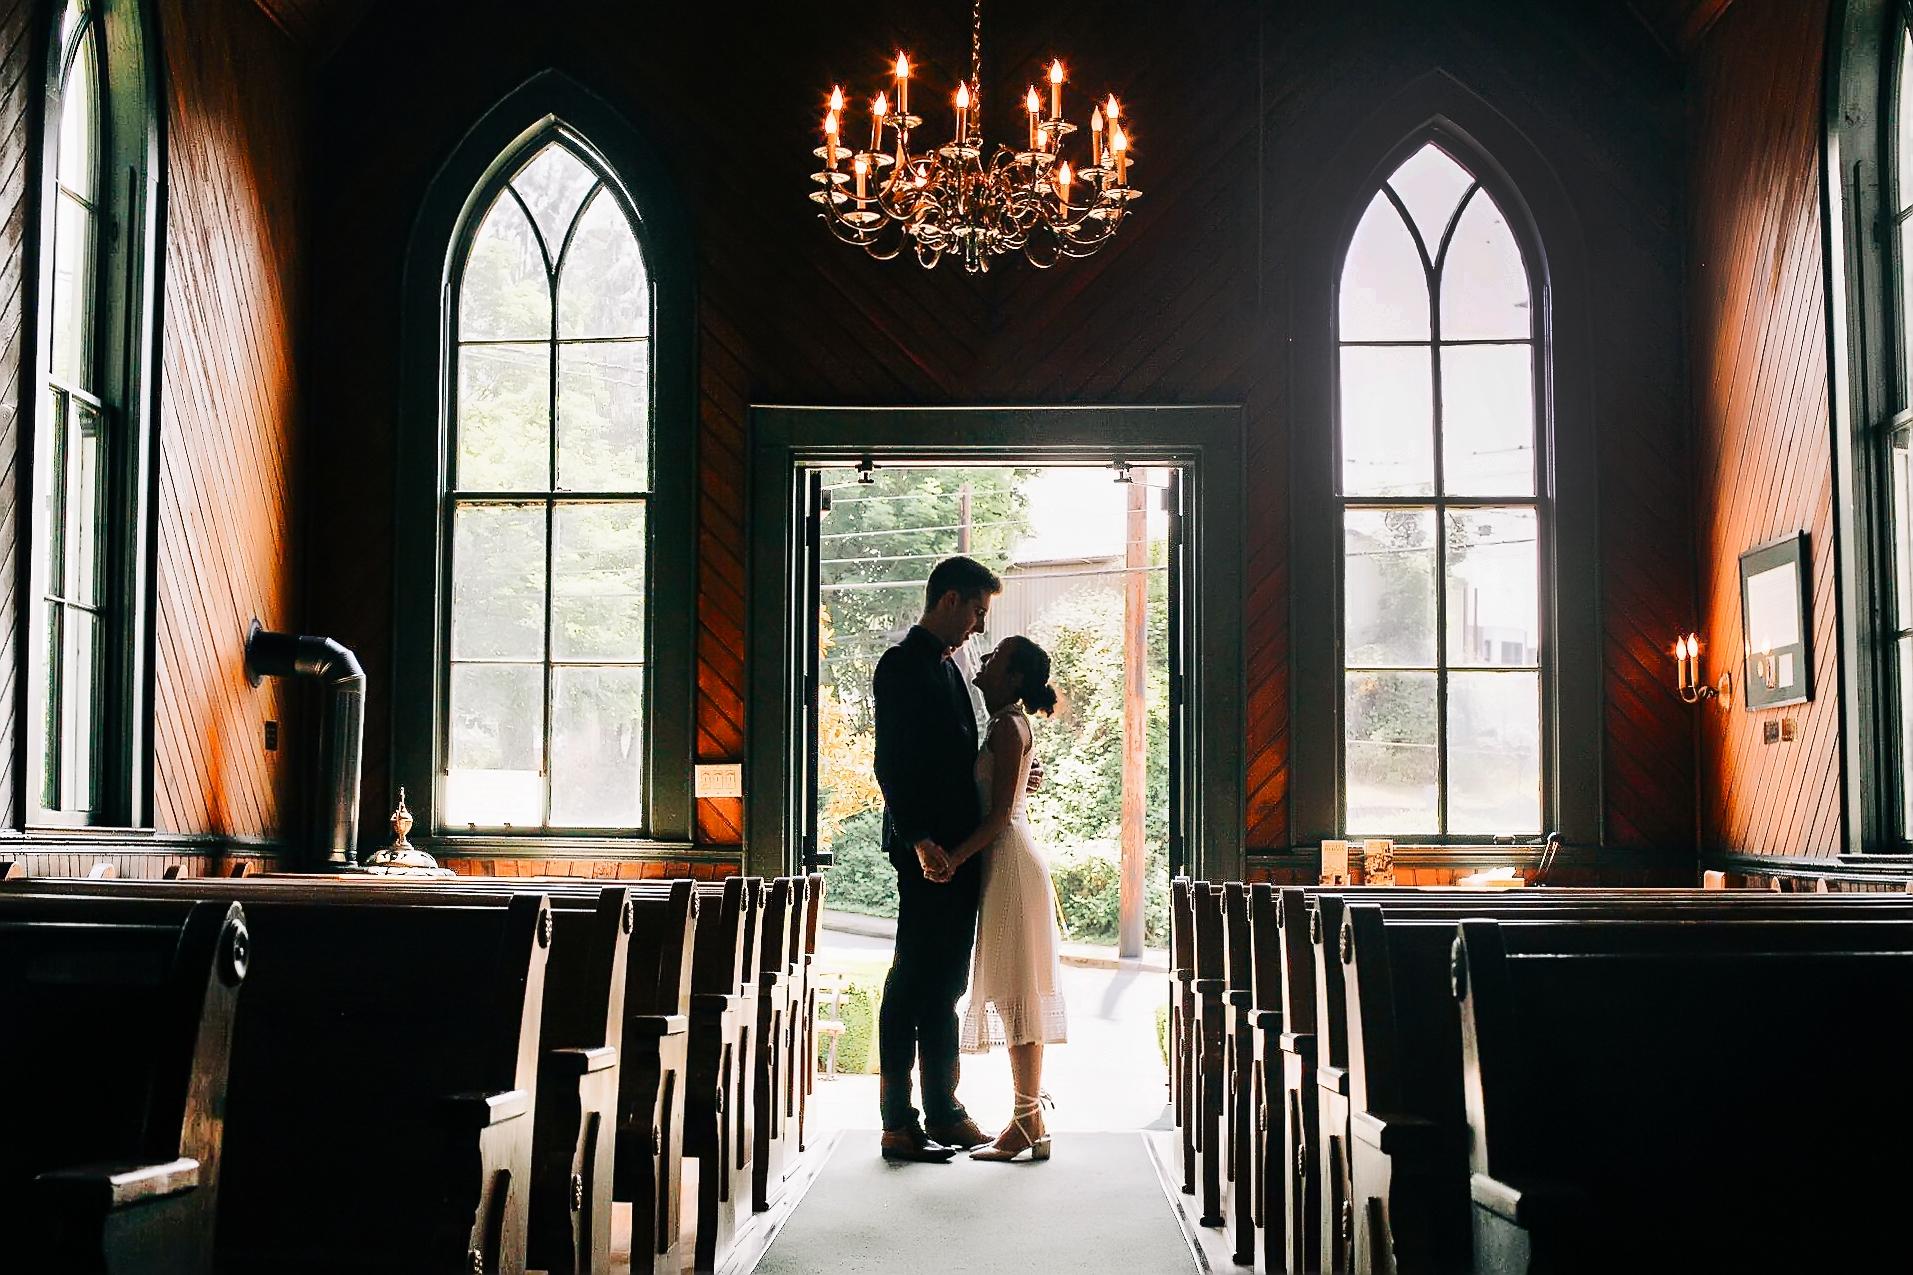 Jasmine + calen - Oaks Pioneer Church - Sherwood, OR